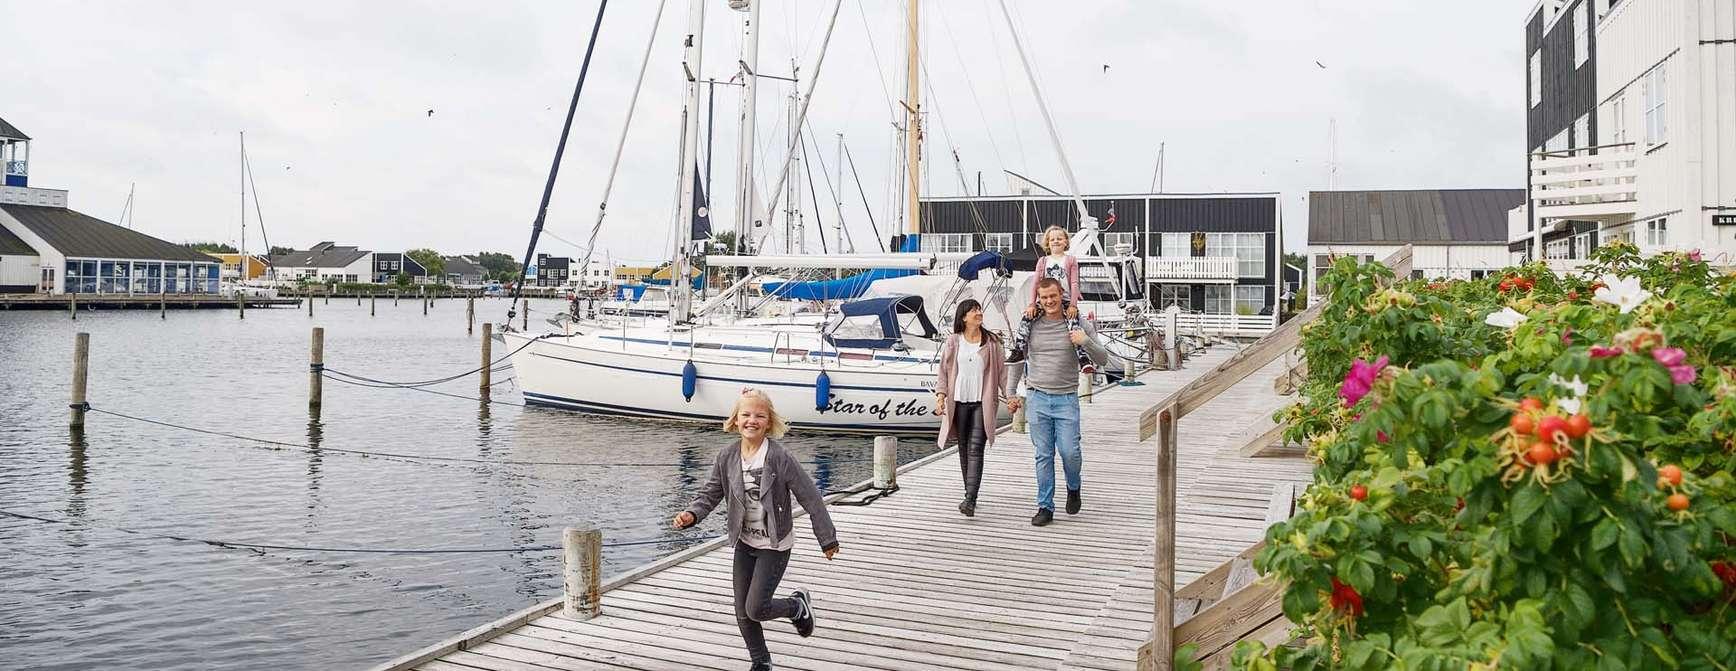 Familie langs havnen i Ebeltoft